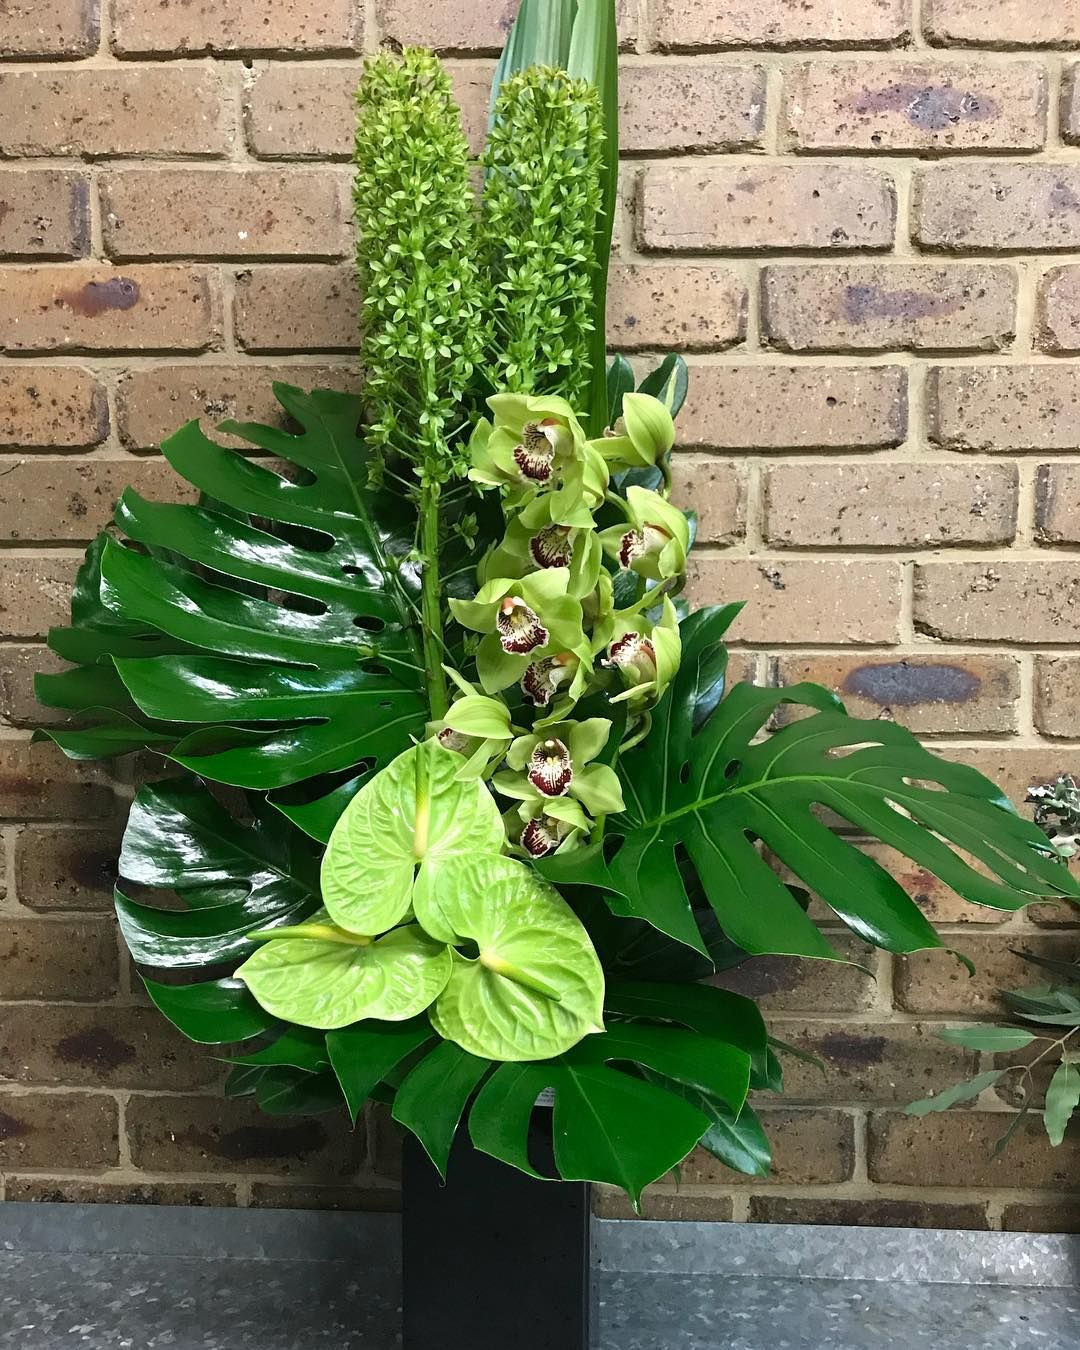 40 Gostos 1 Comentarios Acacia Flowers Acaciaflowers Berwick No Instagram Green Freshblooms Acaciaf Composizioni Floreali Mazzo Di Fiori Fiori